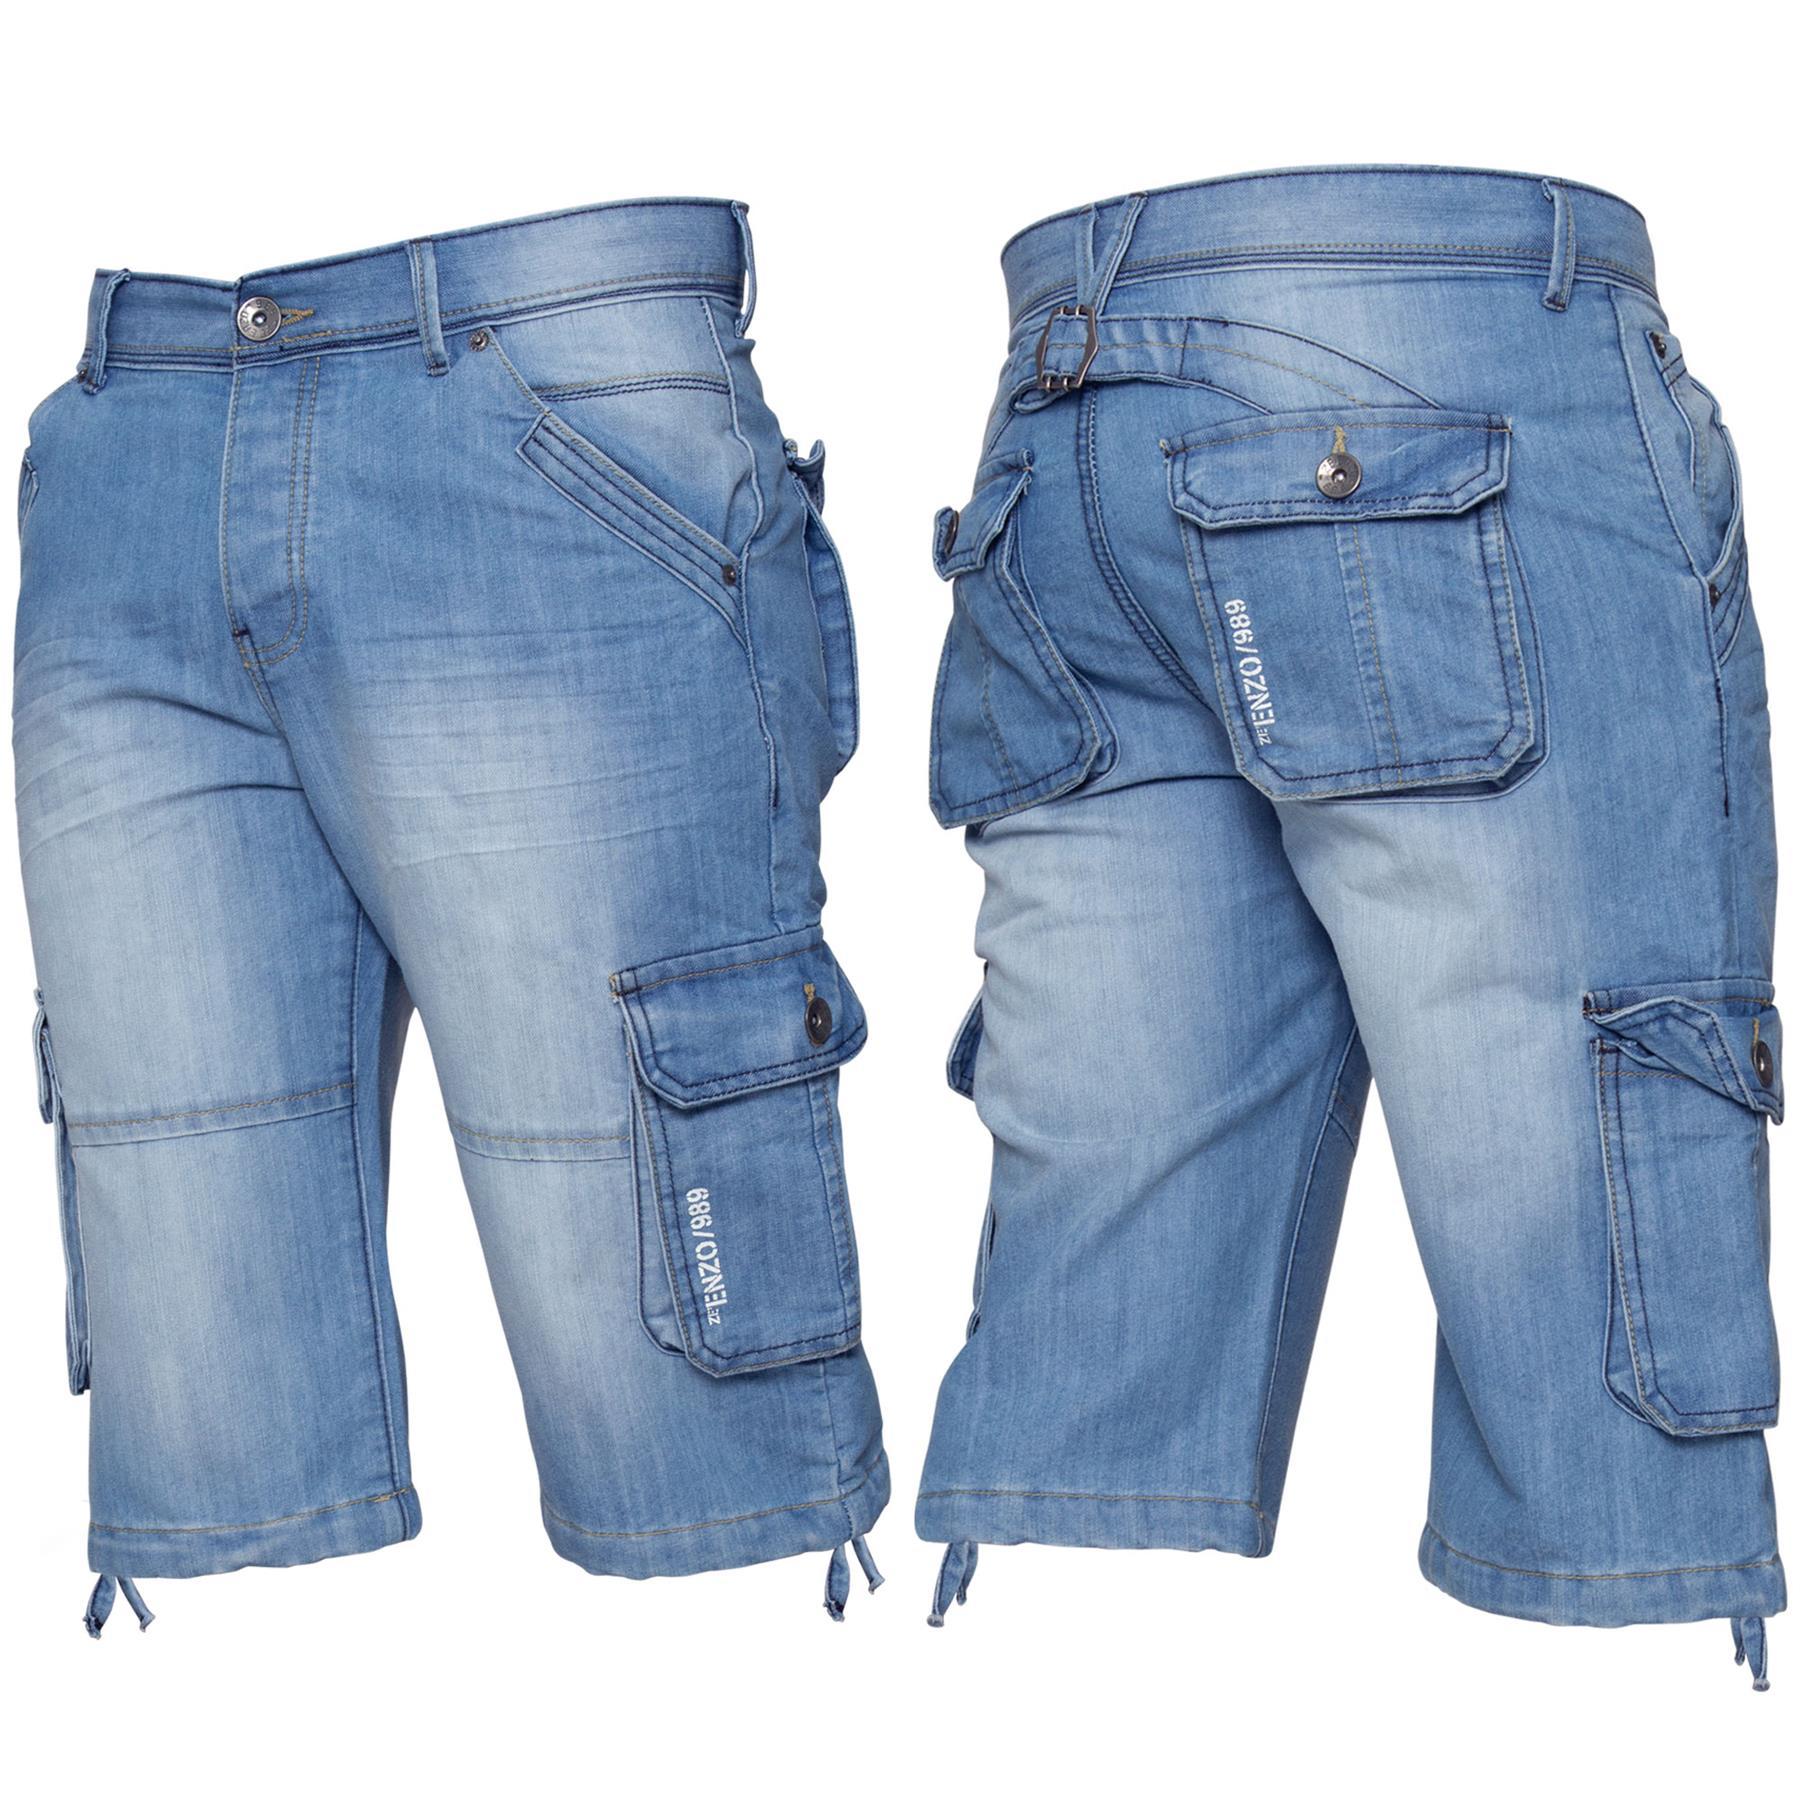 ENZO-Jeans-para-hombre-de-carga-combate-informal-de-verano-Shorts-Pantalones-Cortos-de-Jeans-Todas miniatura 13